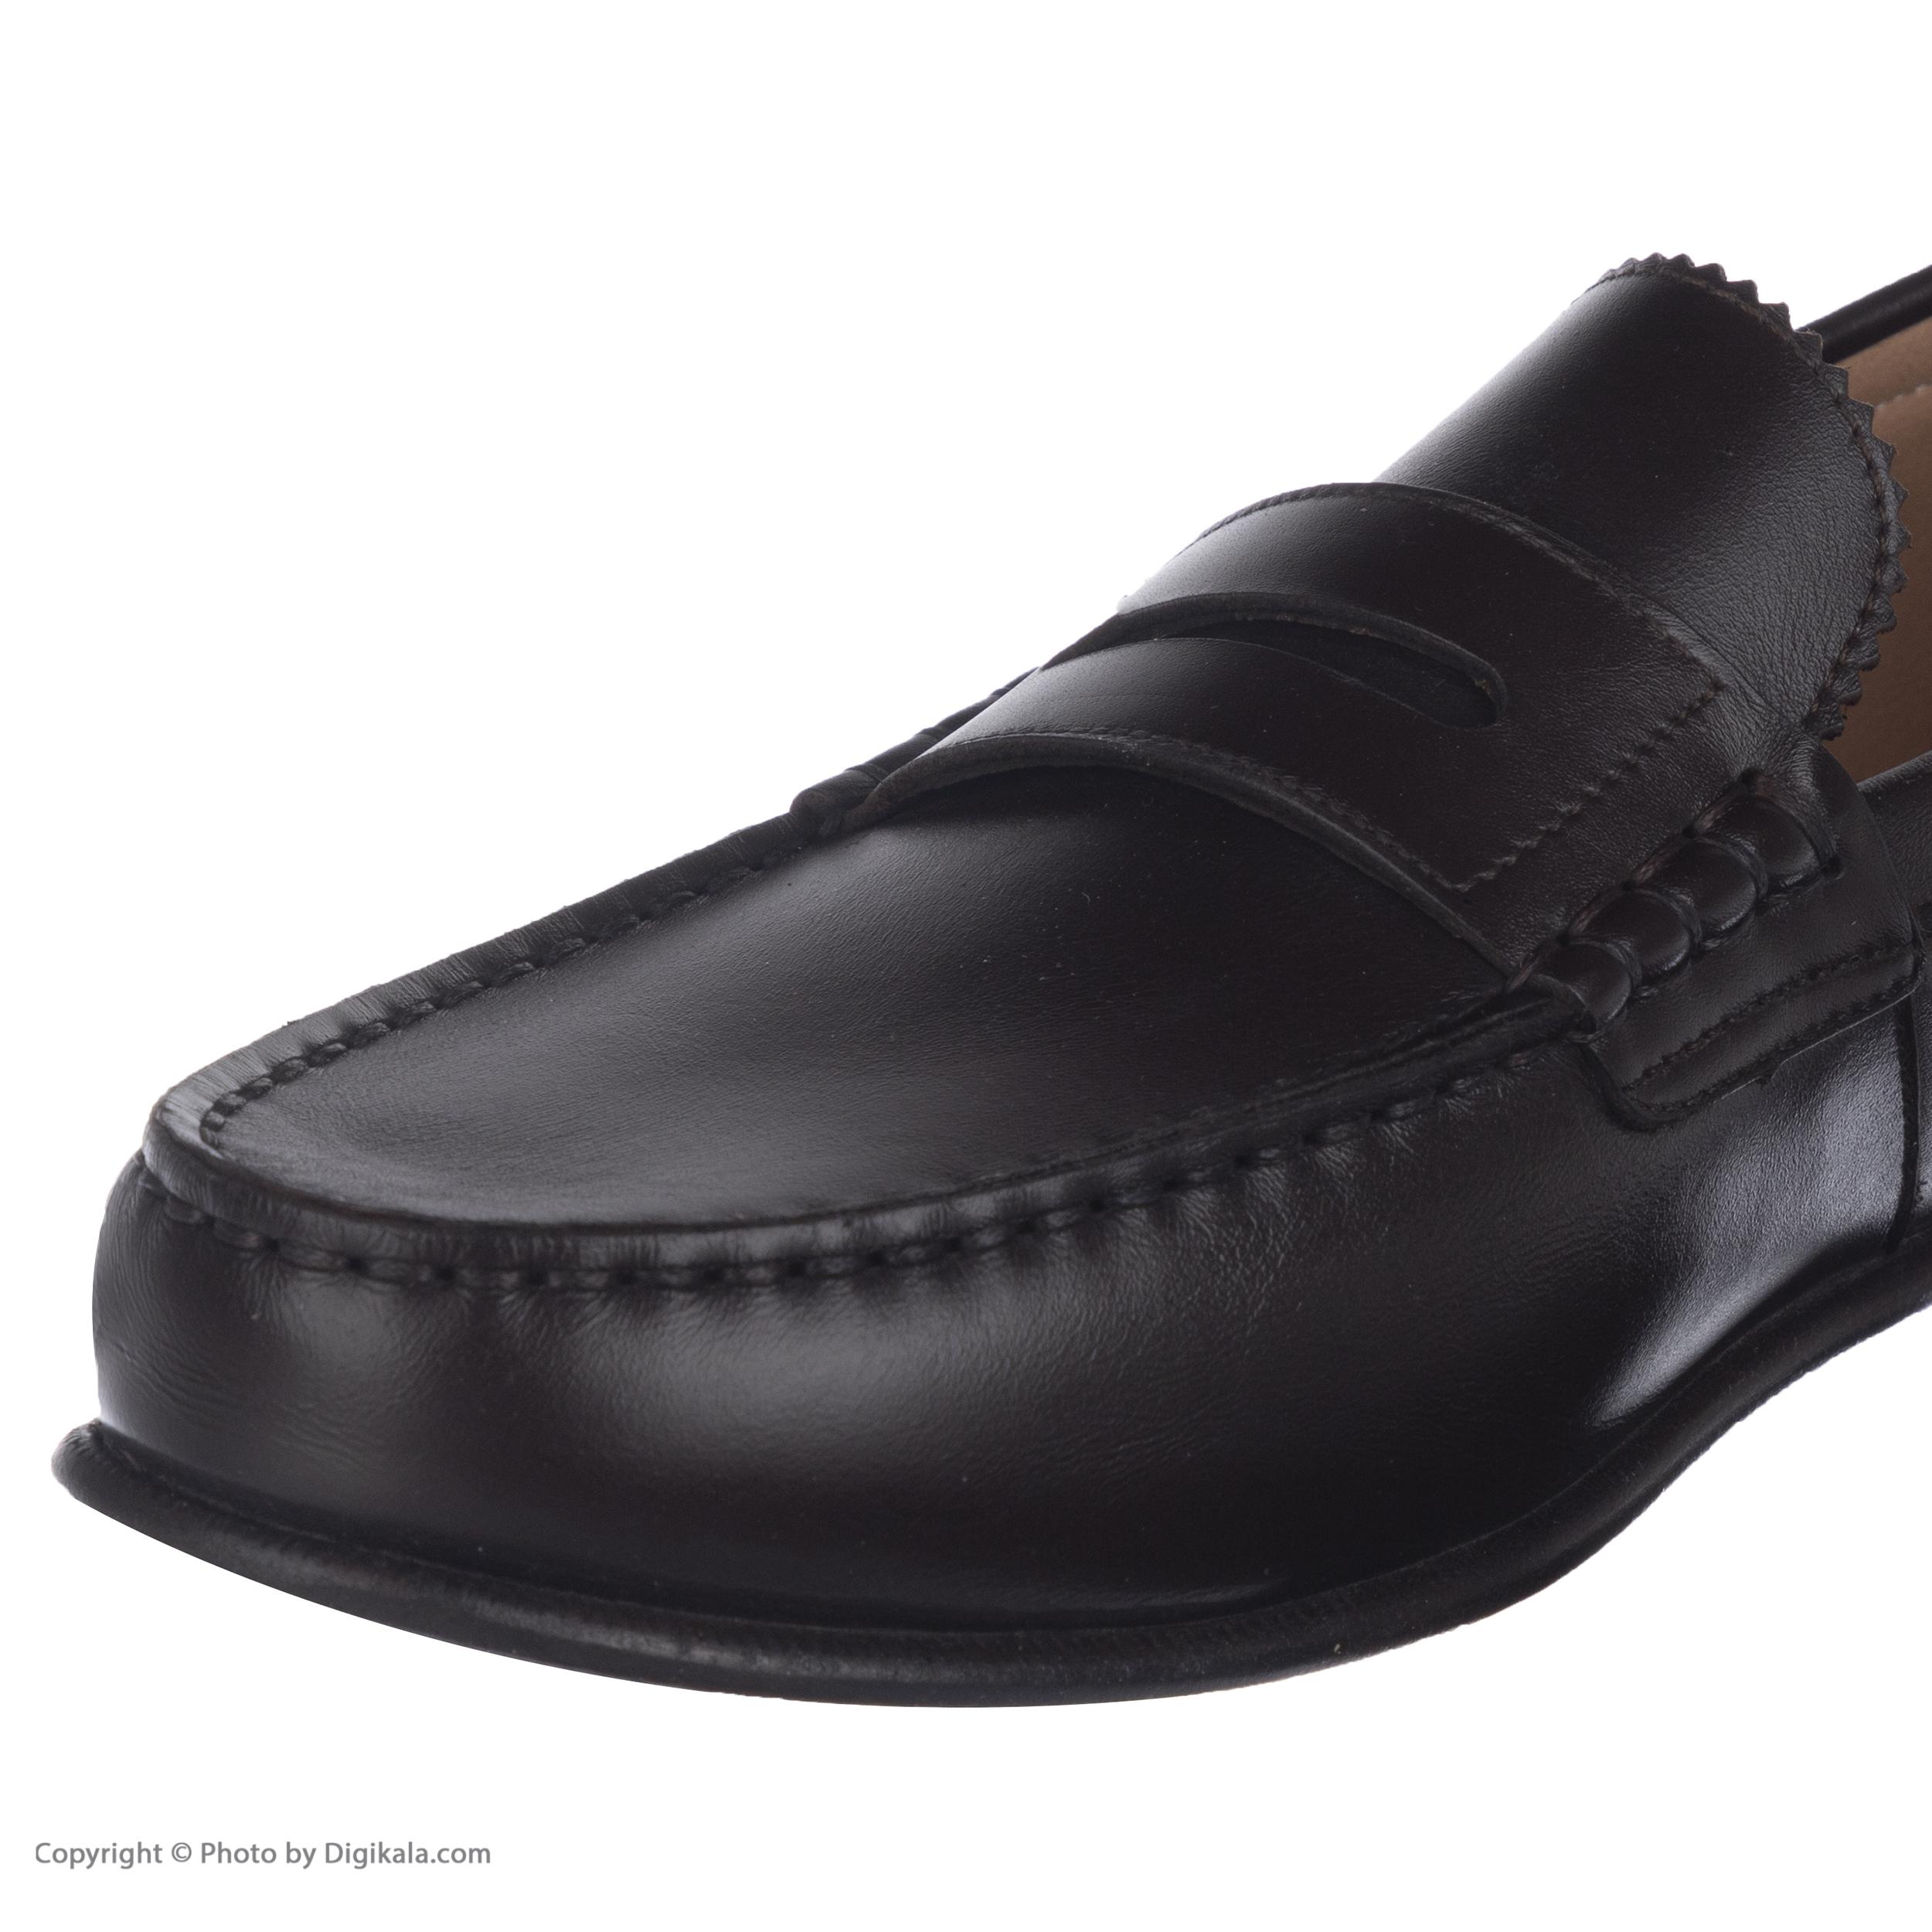 کفش مردانه نظری کد 436 -  - 6